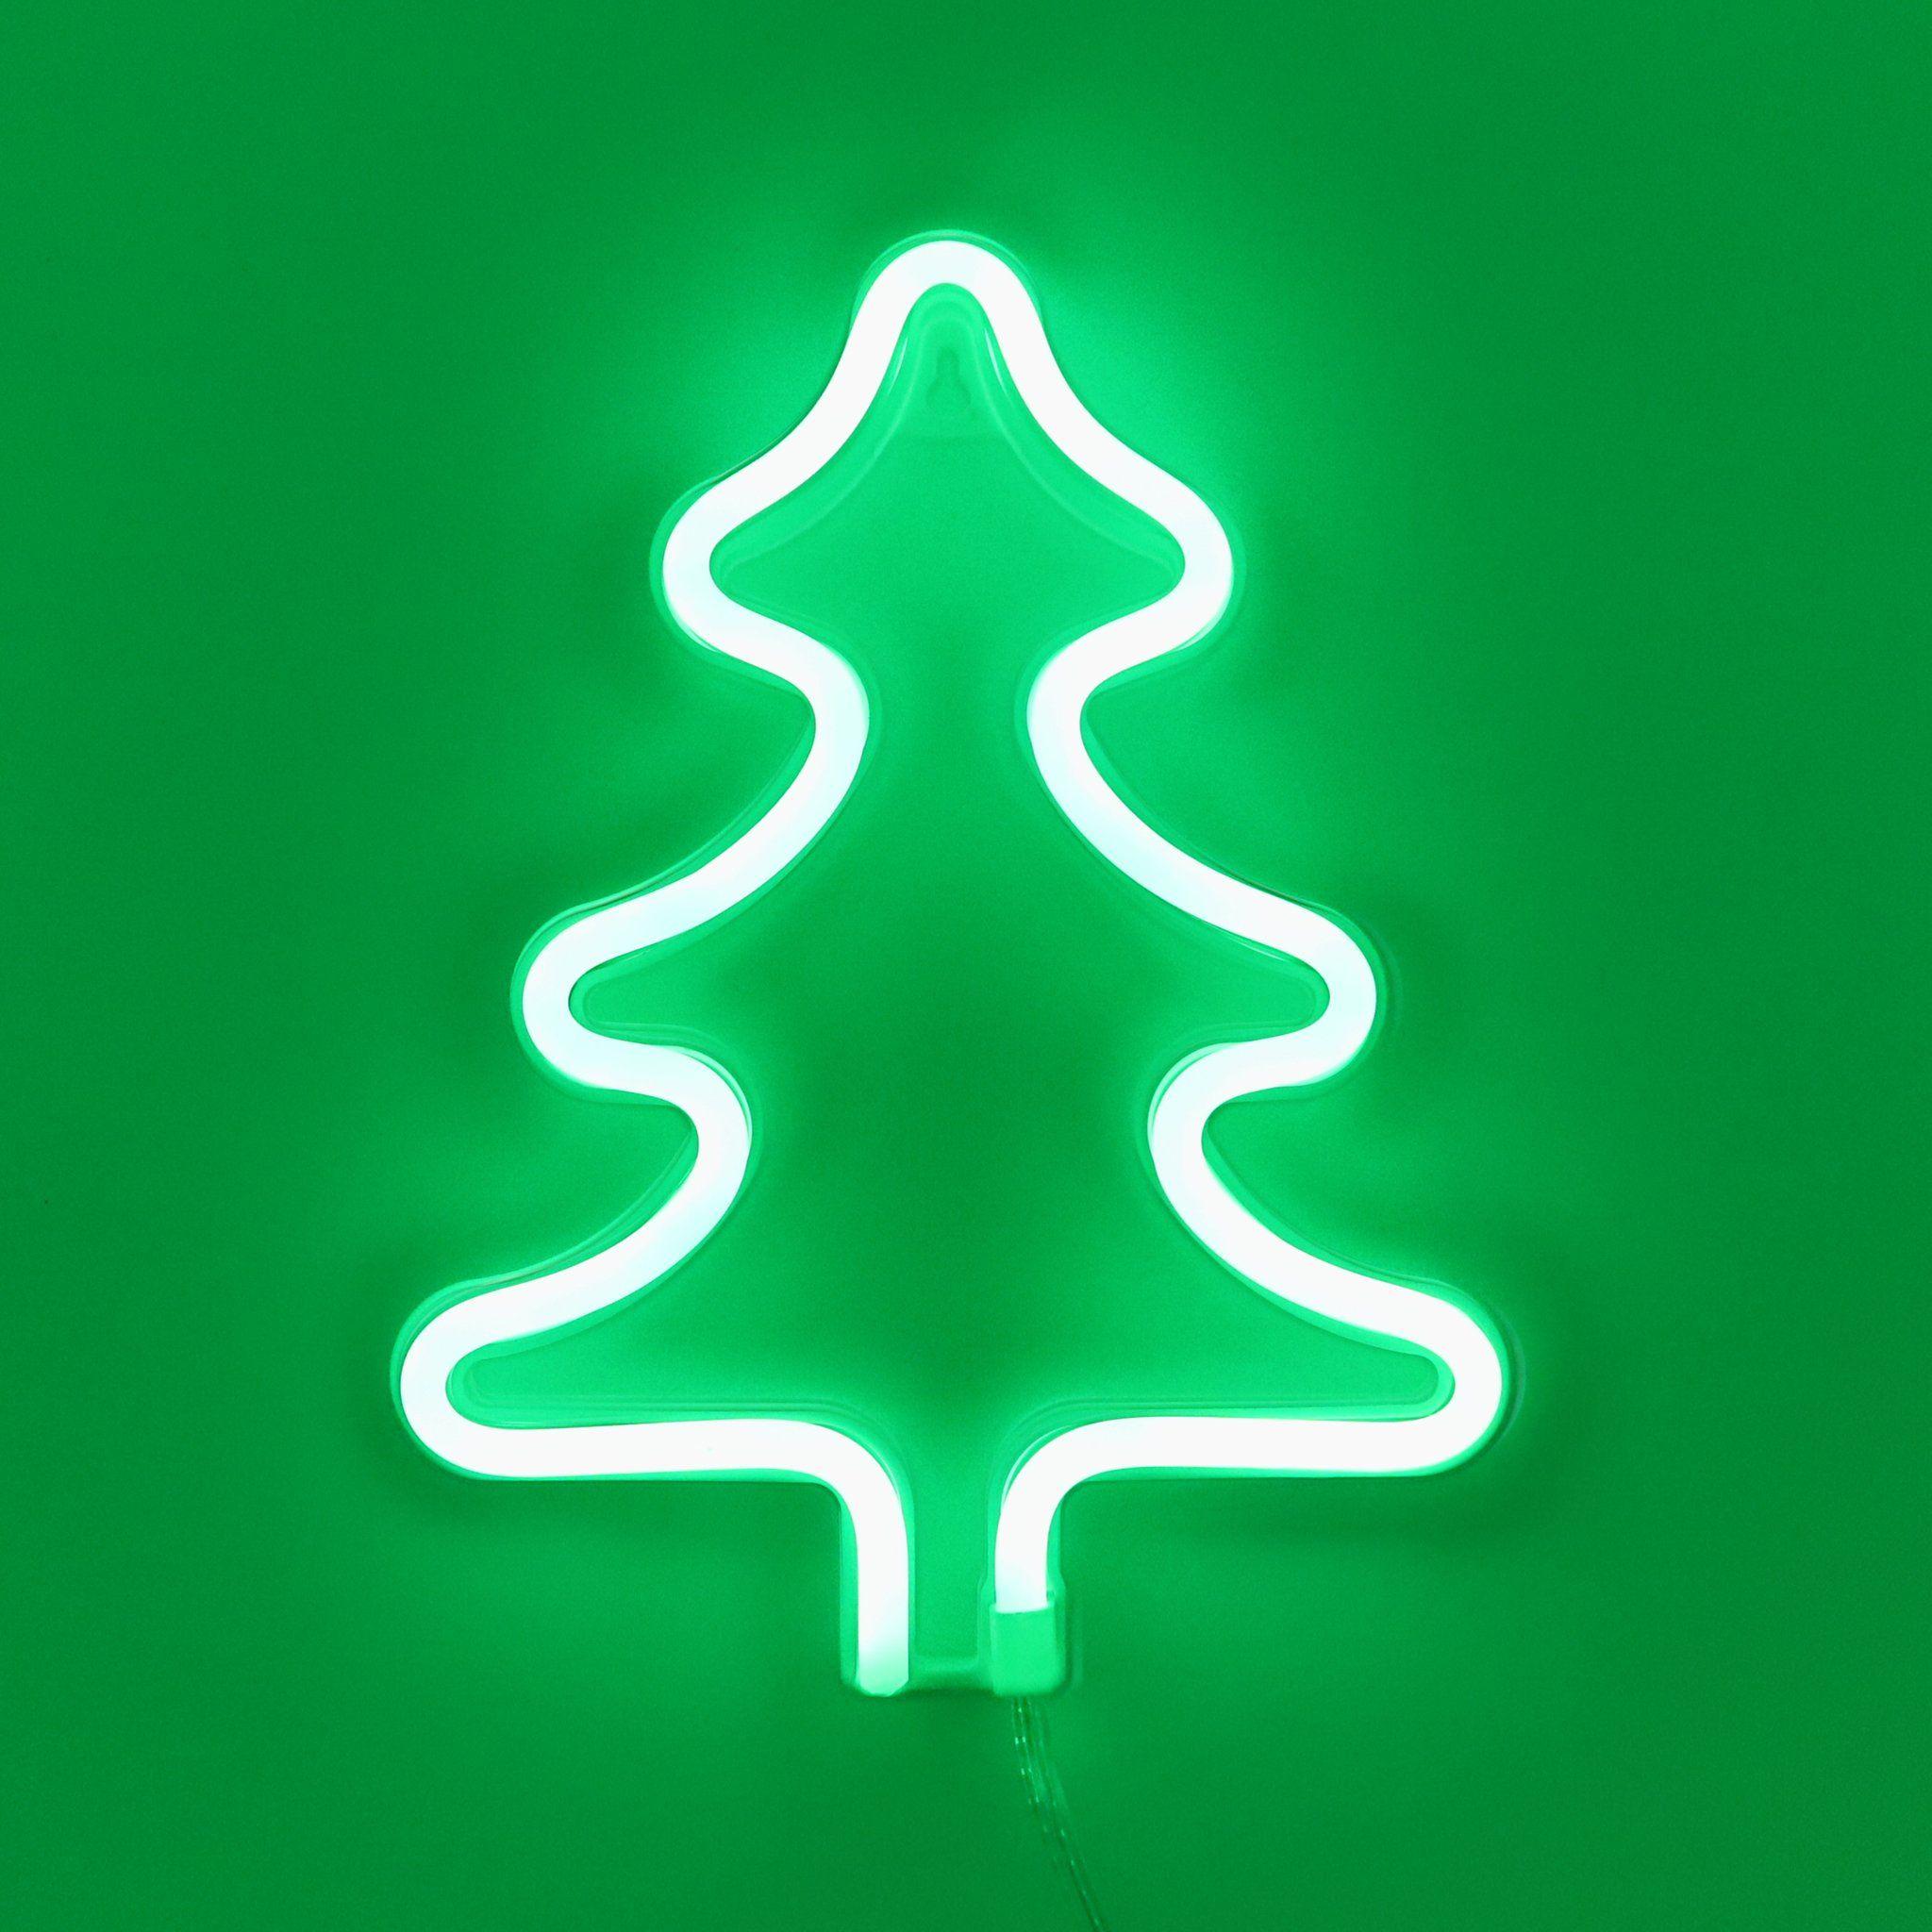 Tonger Green Christmas Tree Wall Led Neon Light Sign Green Christmas Tree Creative Christmas Trees Different Christmas Trees